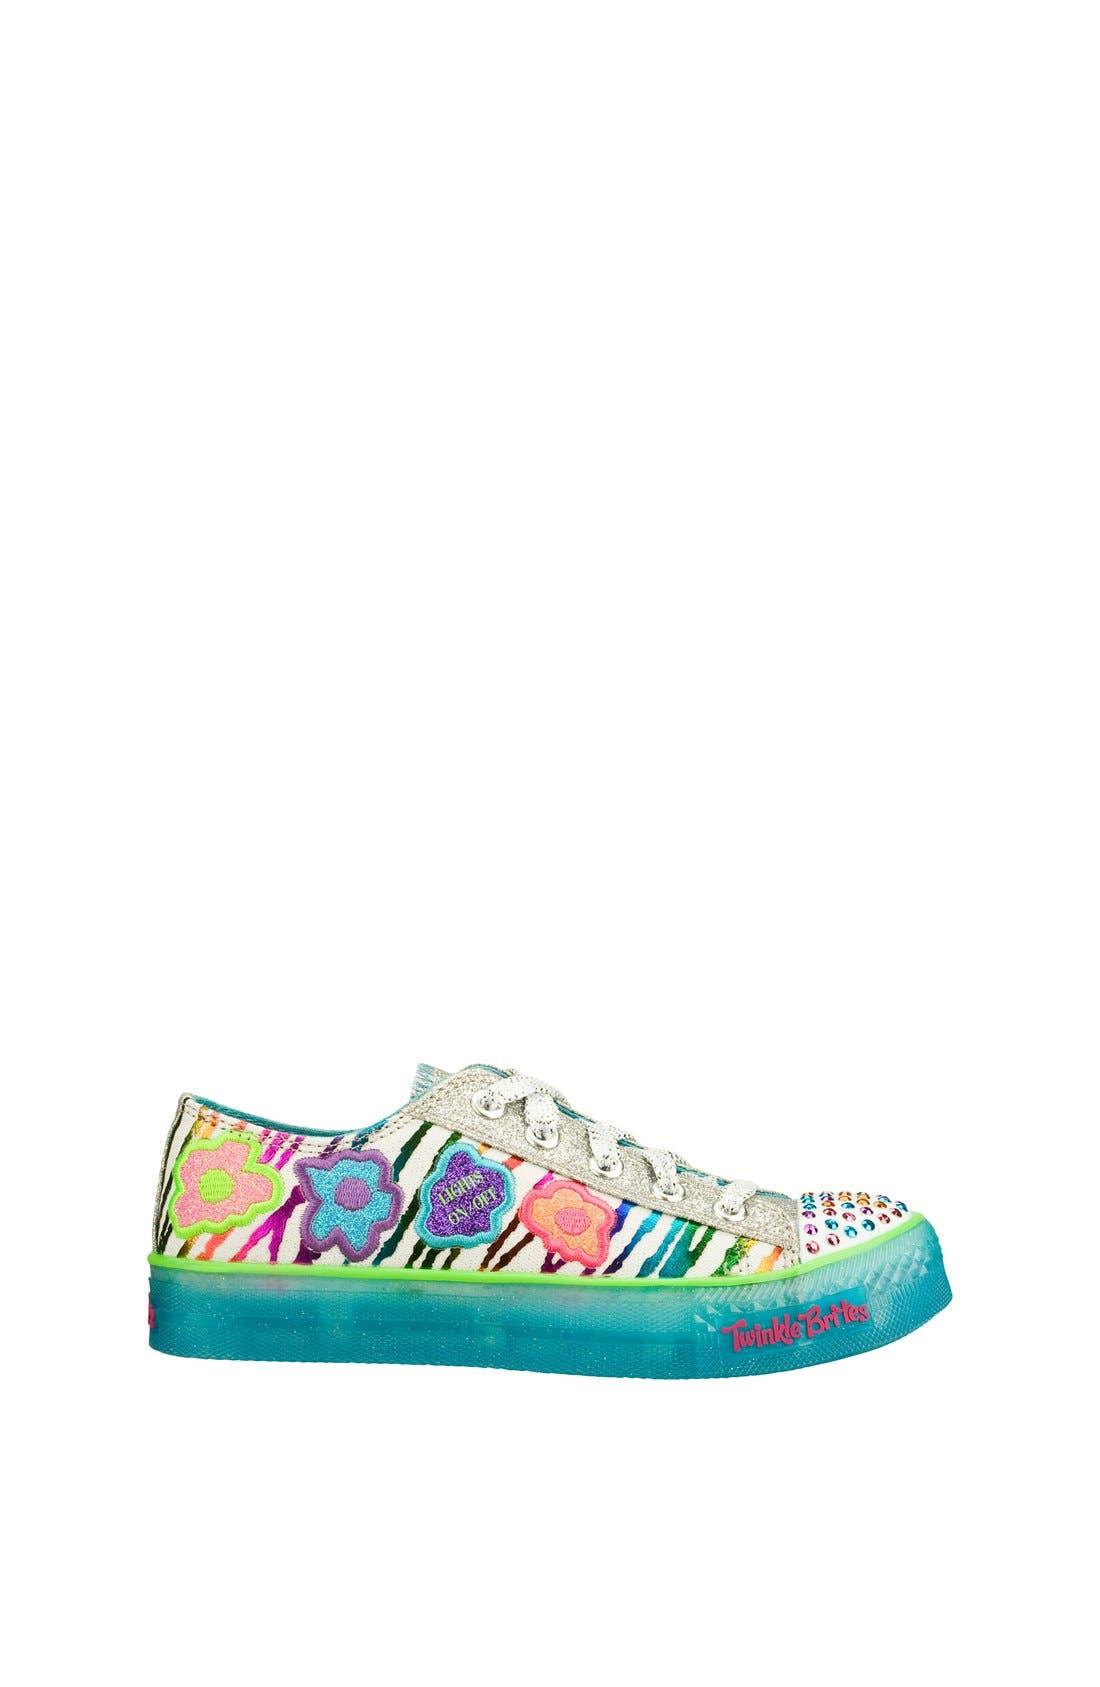 Alternate Image 2  - SKECHERS 'Boogie Lights' Sneaker (Toddler, Little Kid & Big Kid)